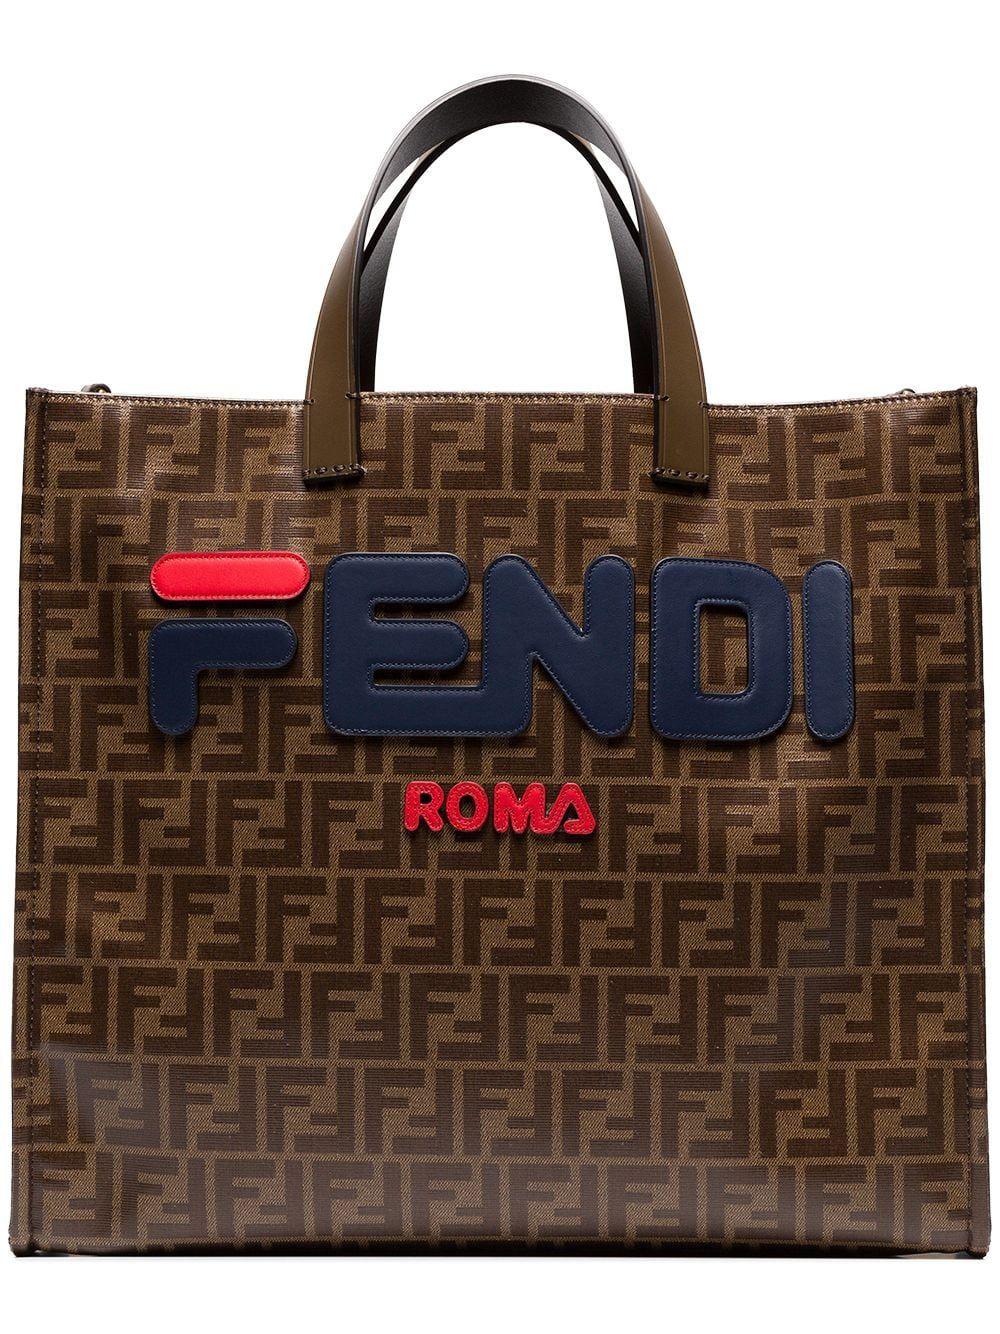 Fendi Fendi Mania Brown Logo Print Tote Bag 3d2e73b8d3fa7